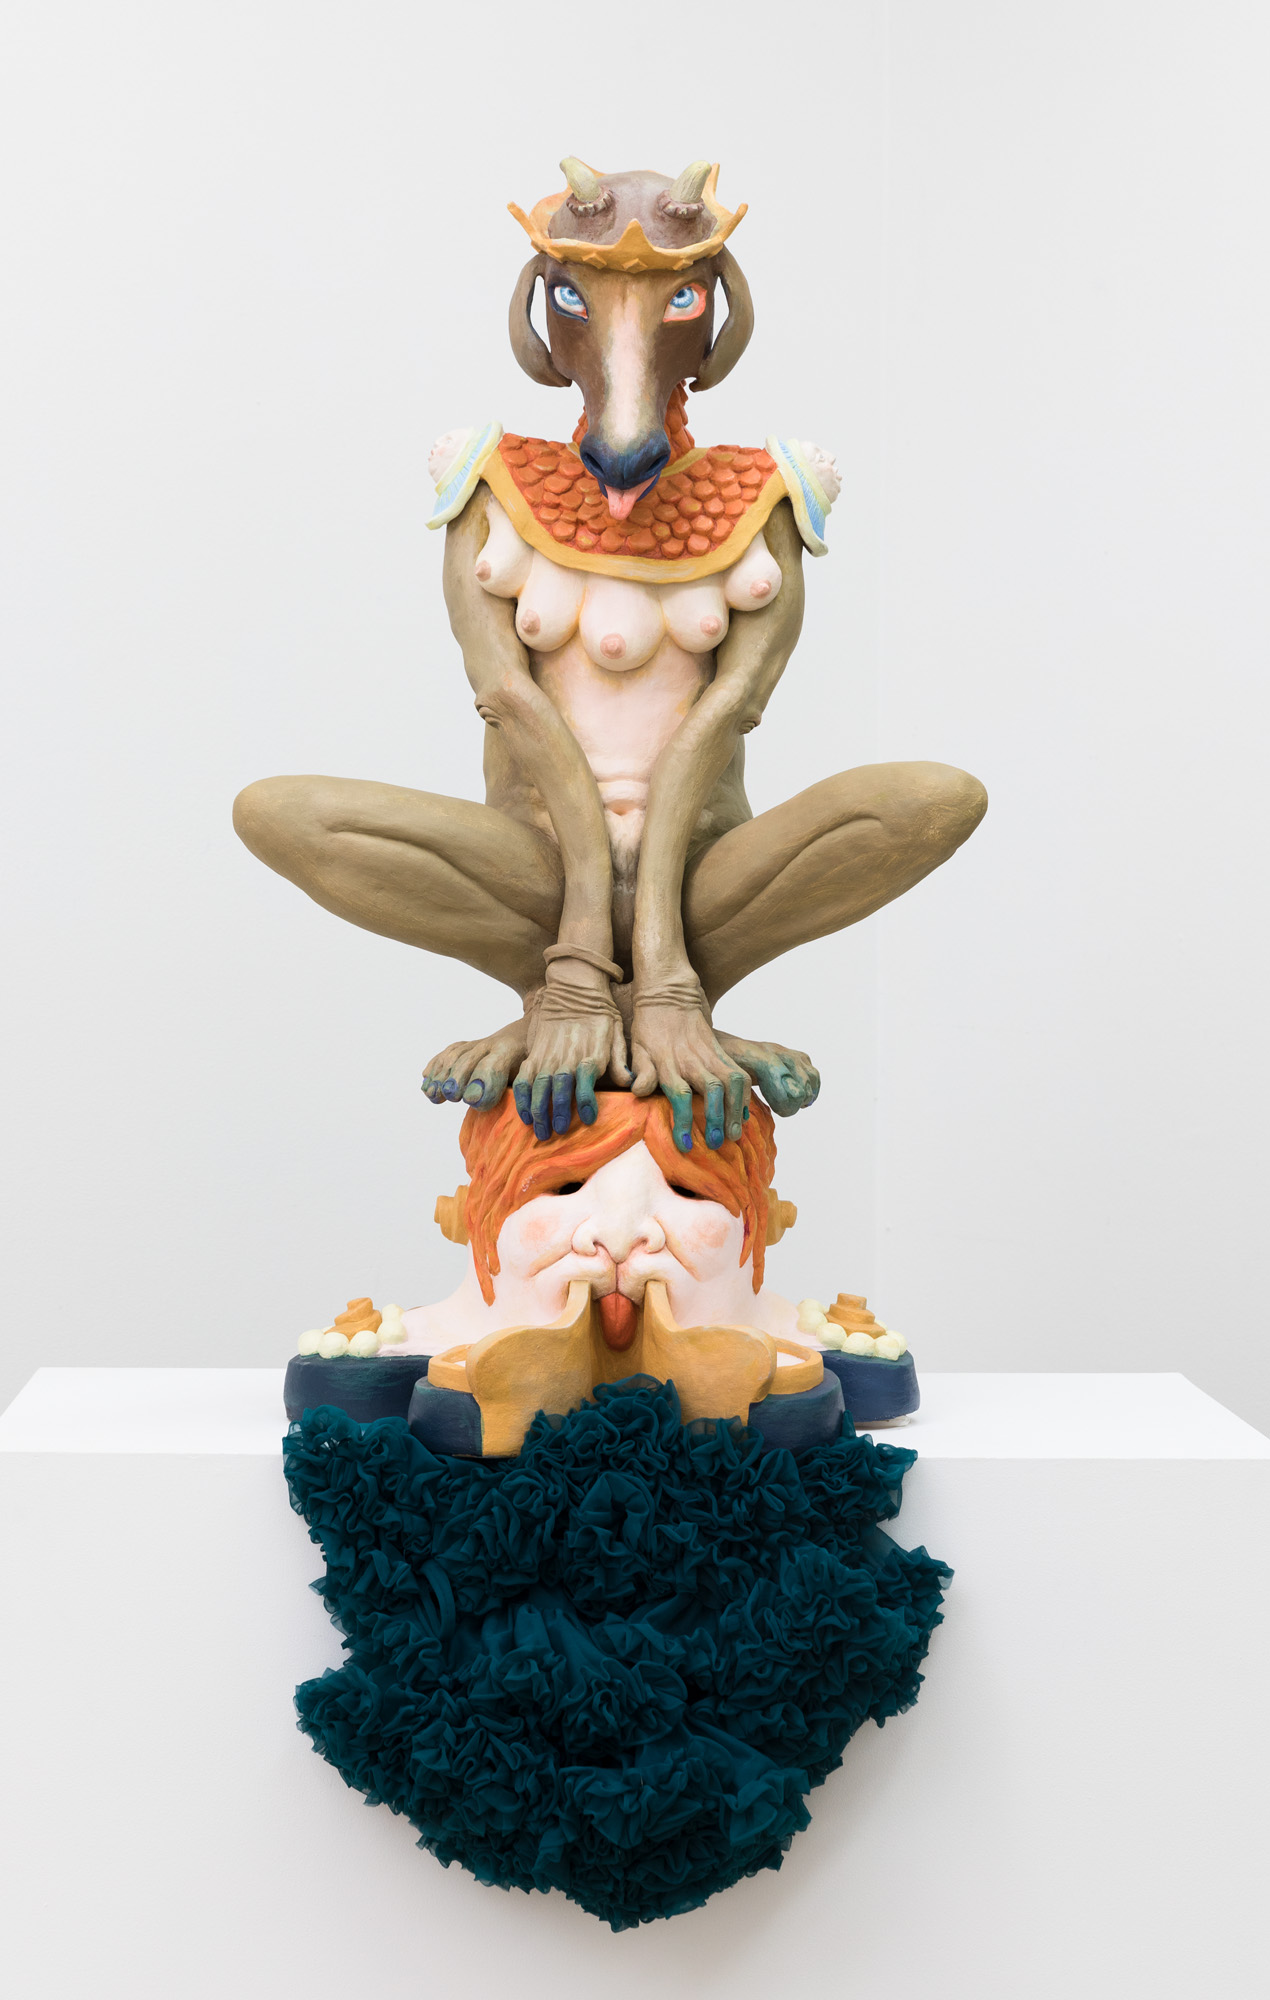 Sybil Sphinx, 2017, hand-built ceramic, oil paint, found textile